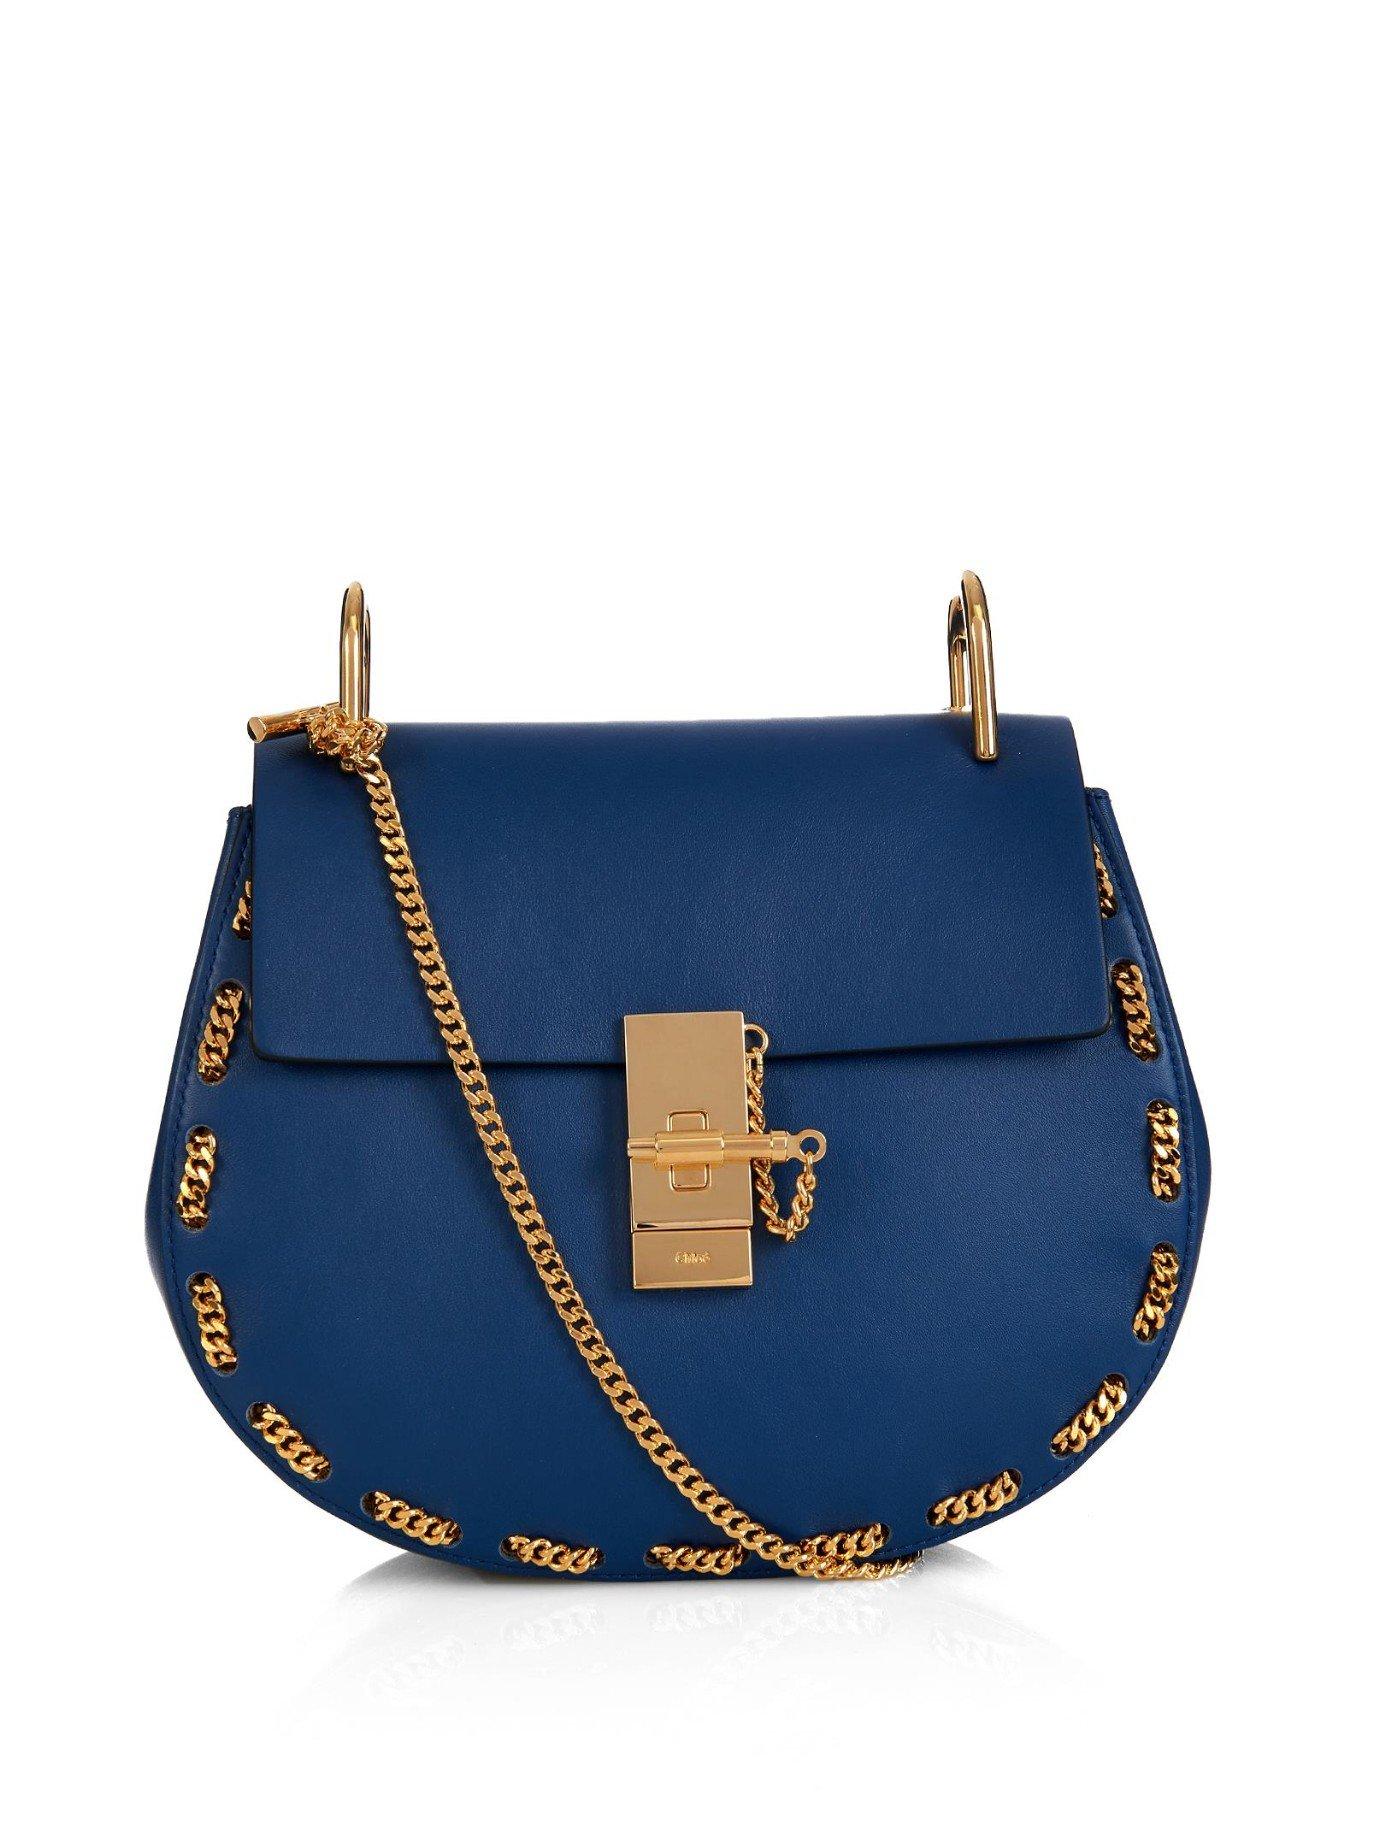 Chlo�� Drew Small Threaded-Chain Shoulder Bag in Blue | Lyst